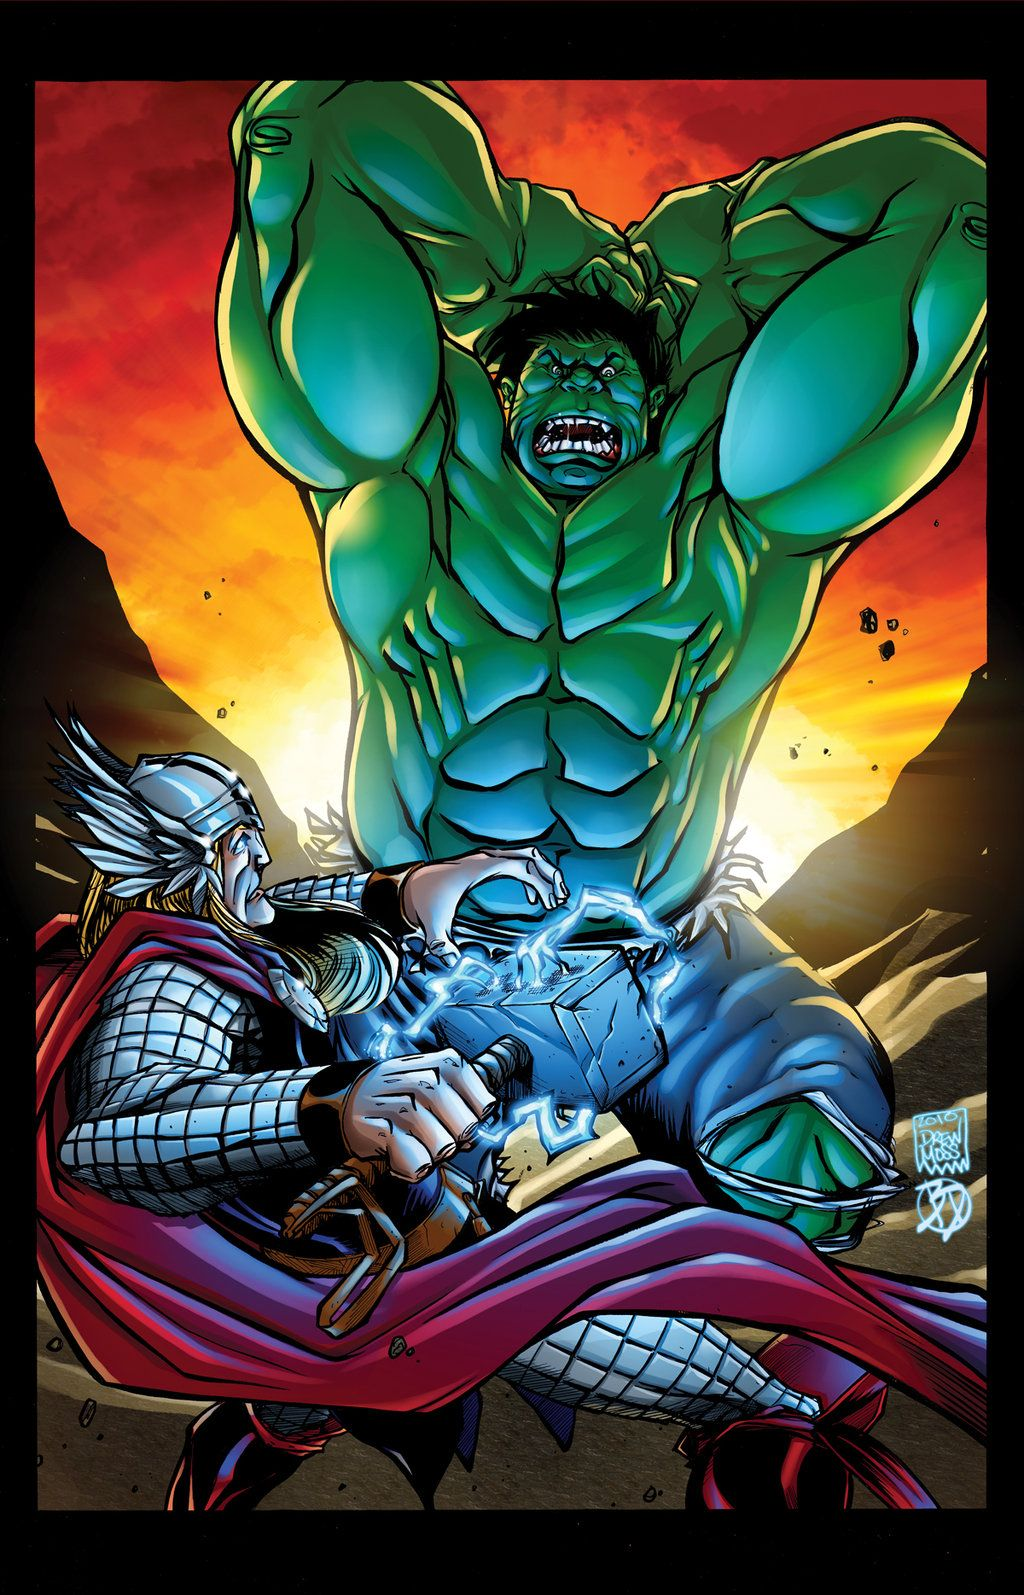 #Hulk #Fan #Art. (Hulk vs Thor) By: BDStevens. (THE * 5 * STÅR * ÅWARD * OF: * AW YEAH, IT'S MAJOR ÅWESOMENESS!!!™)[THANK Ü 4 PINNING!!!<·><]<©>ÅÅÅ+(OB4E)